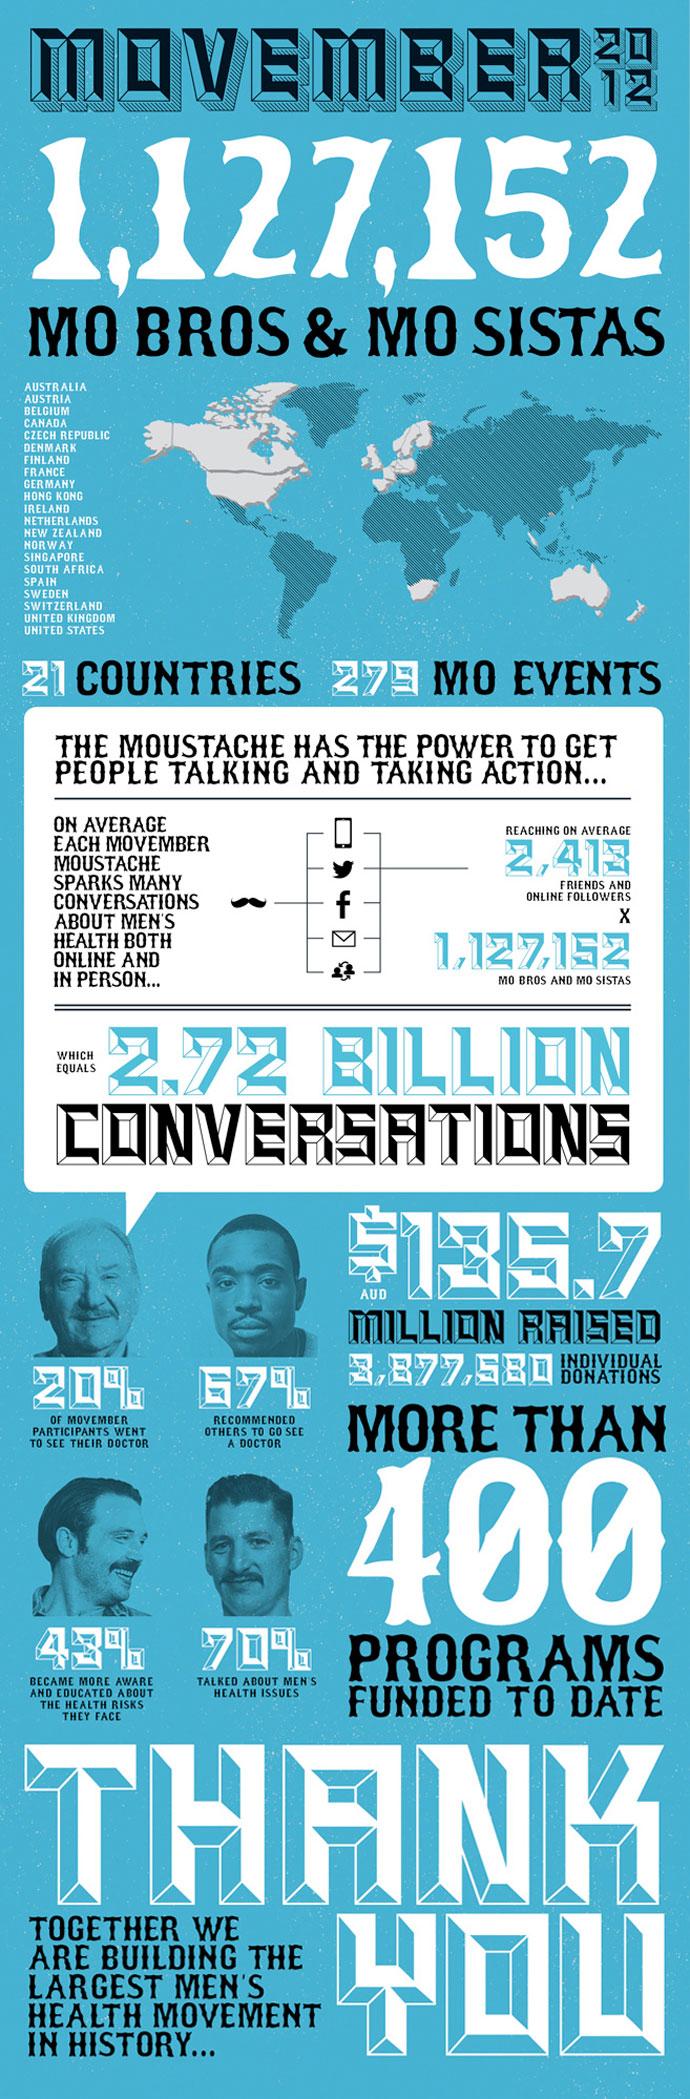 MovemberBrand, not for profit branding